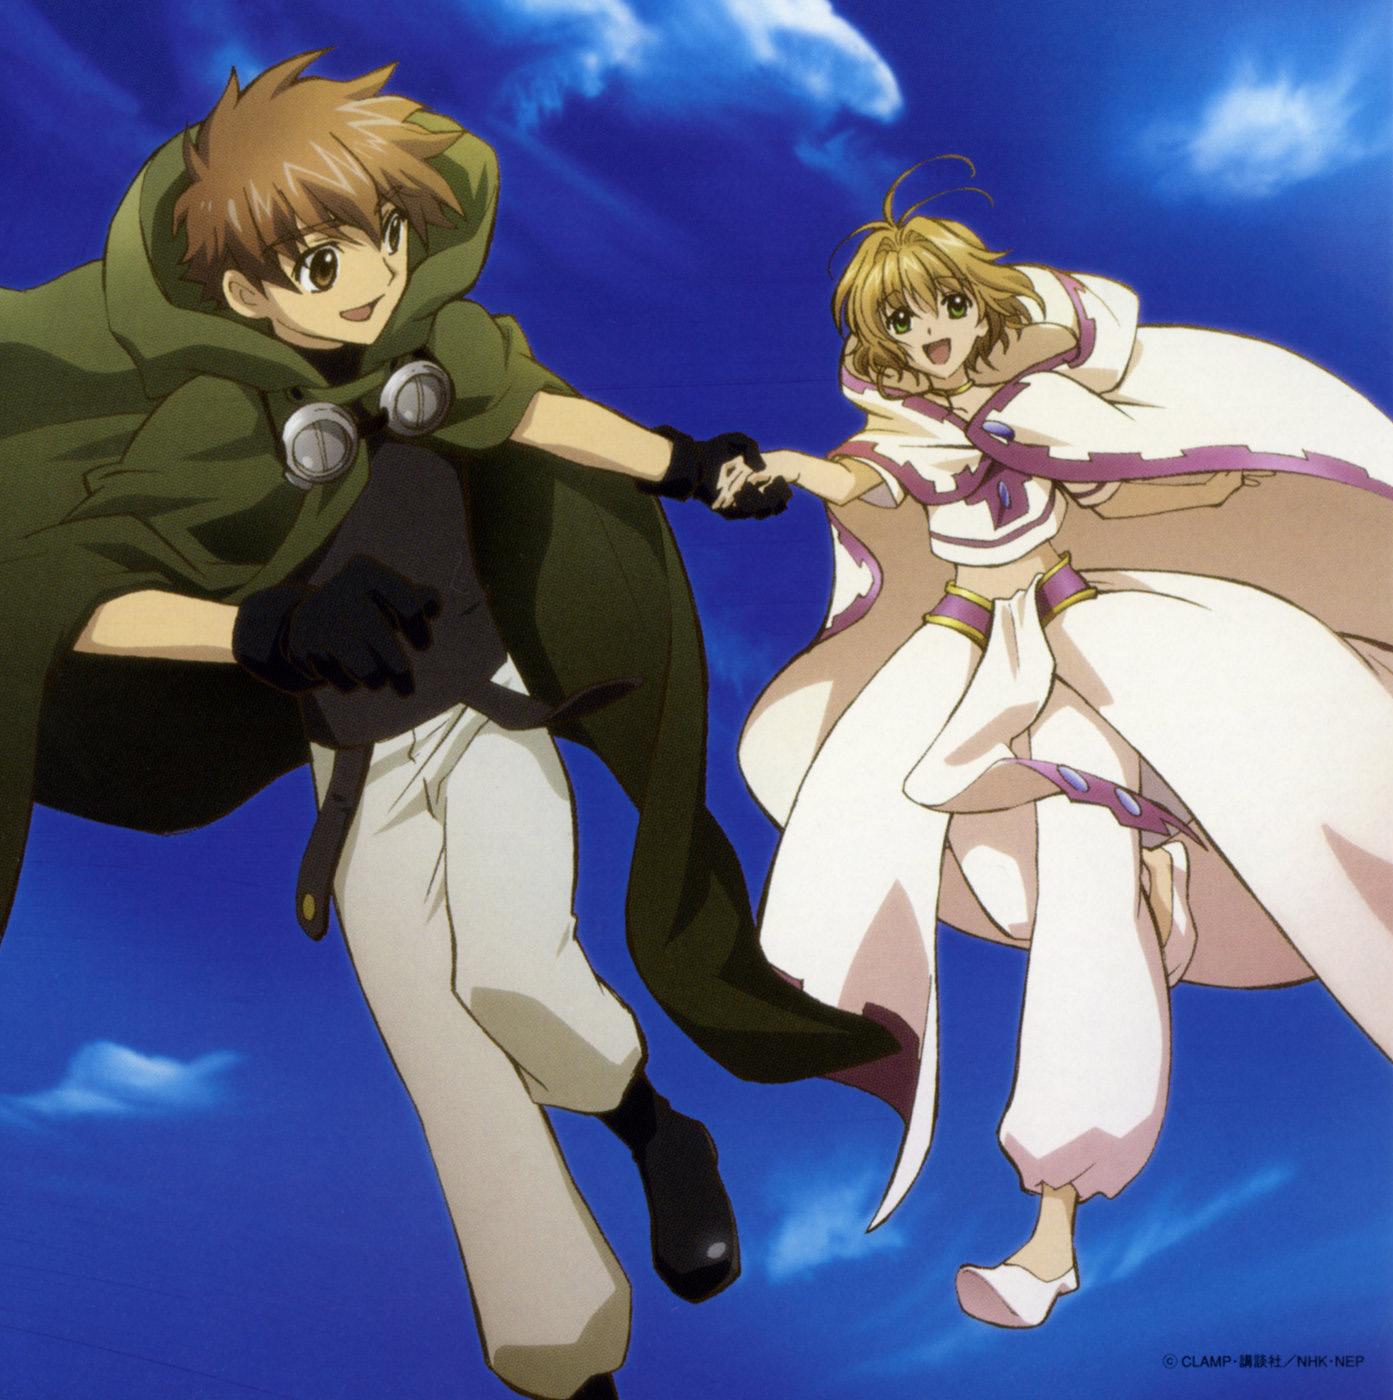 Tsubasa Reservoir Chronicle: Tsubasa Chronicle 2nd Series